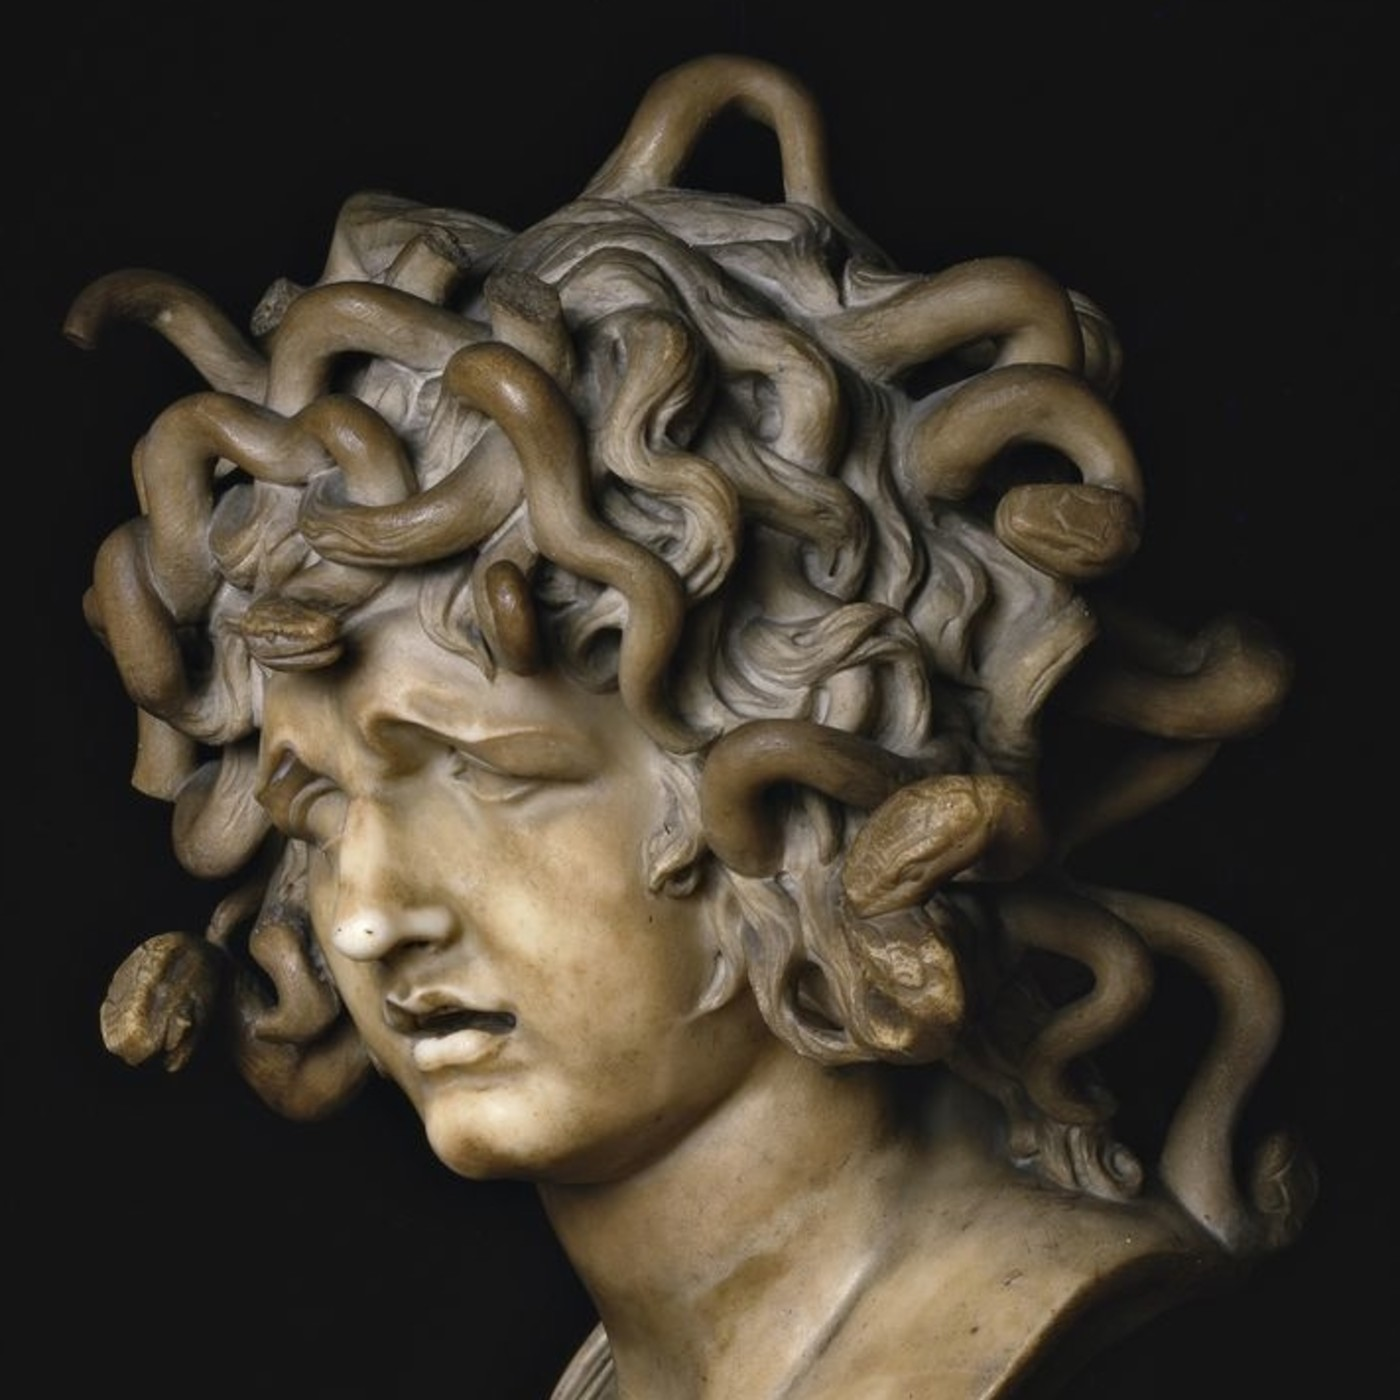 EXTRA. Detrás del mito de Medusa